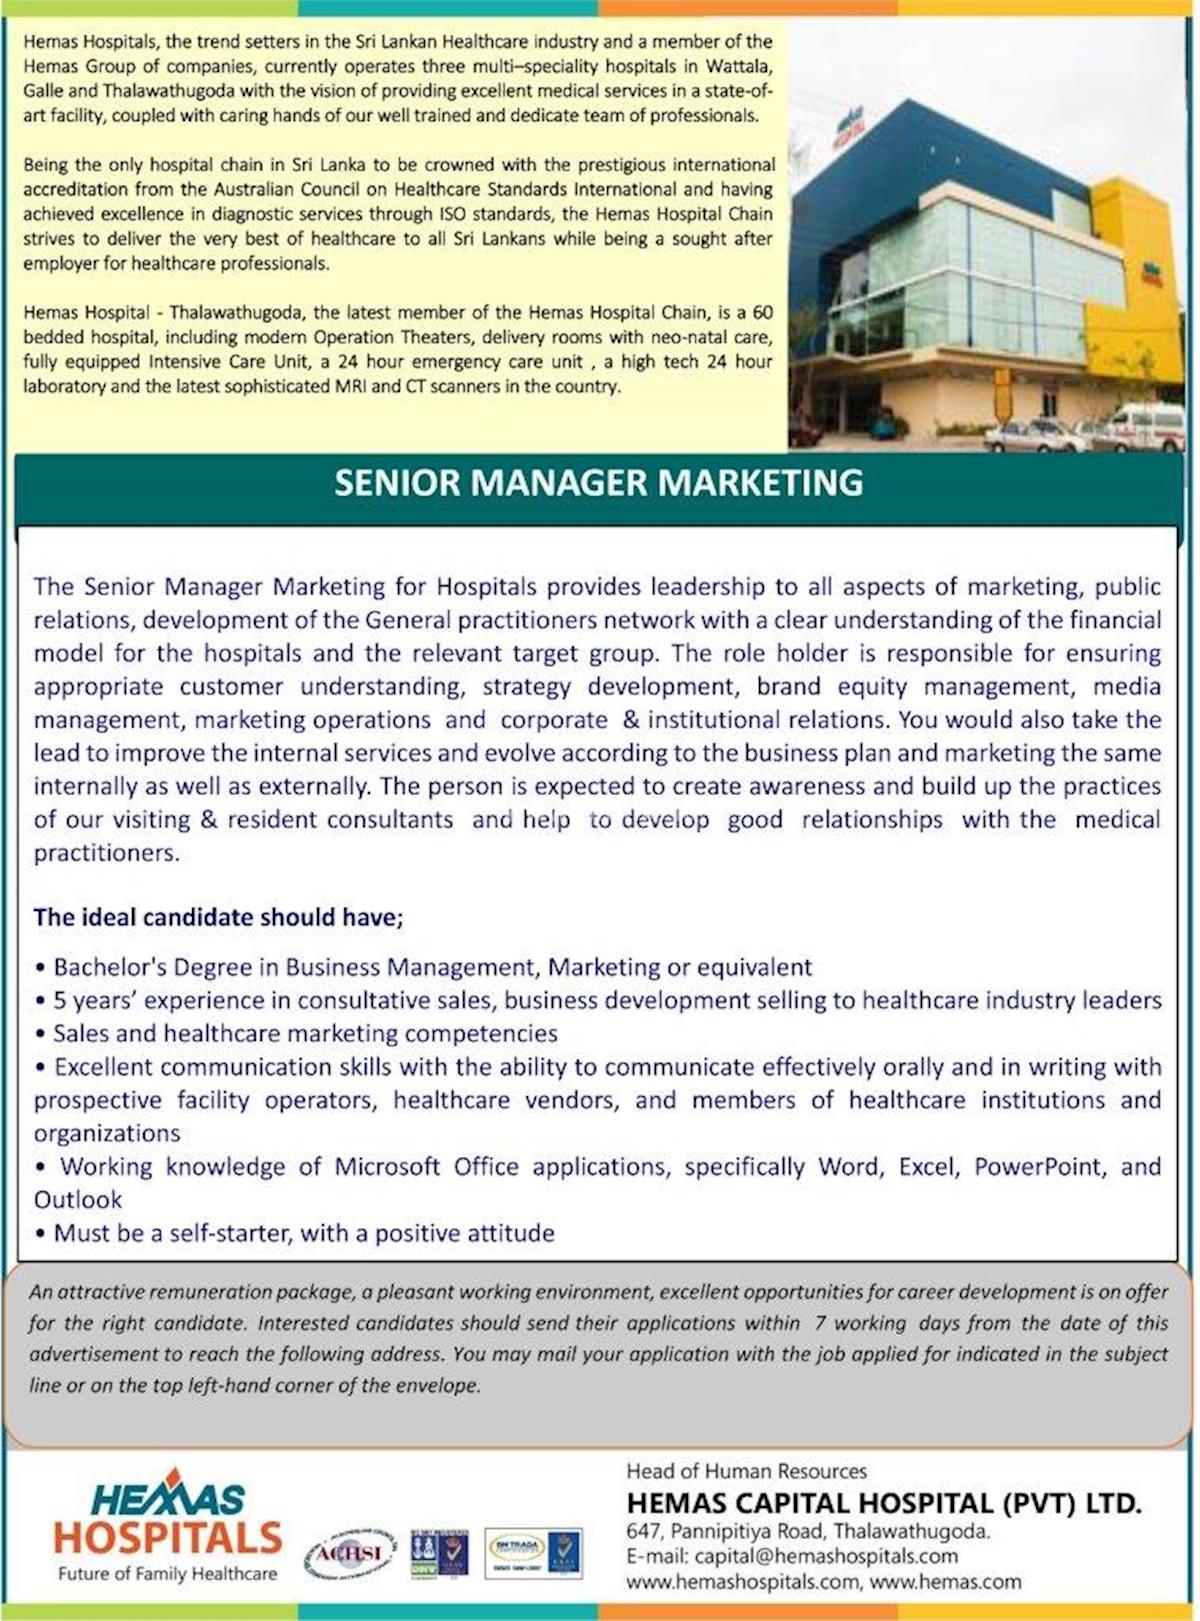 Senior Manager Marketing at Hemas Hospitals